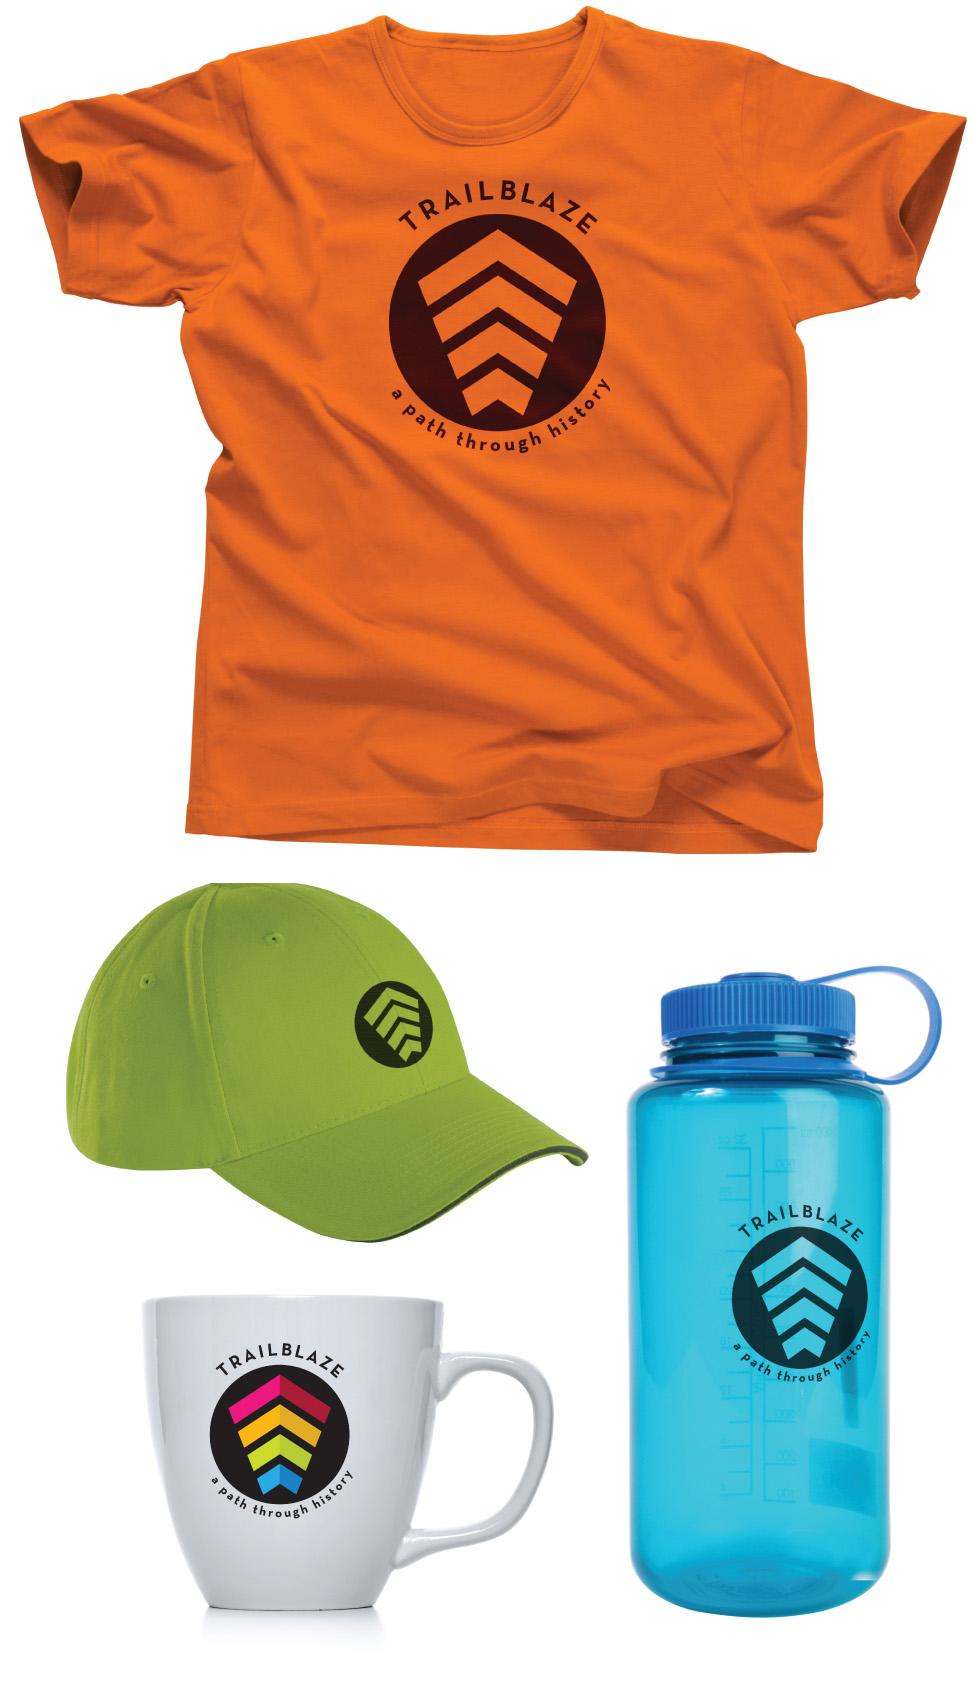 Branding Design, T-shirt Design, Product Design, Coffee Mug Design, Water Bottle Design